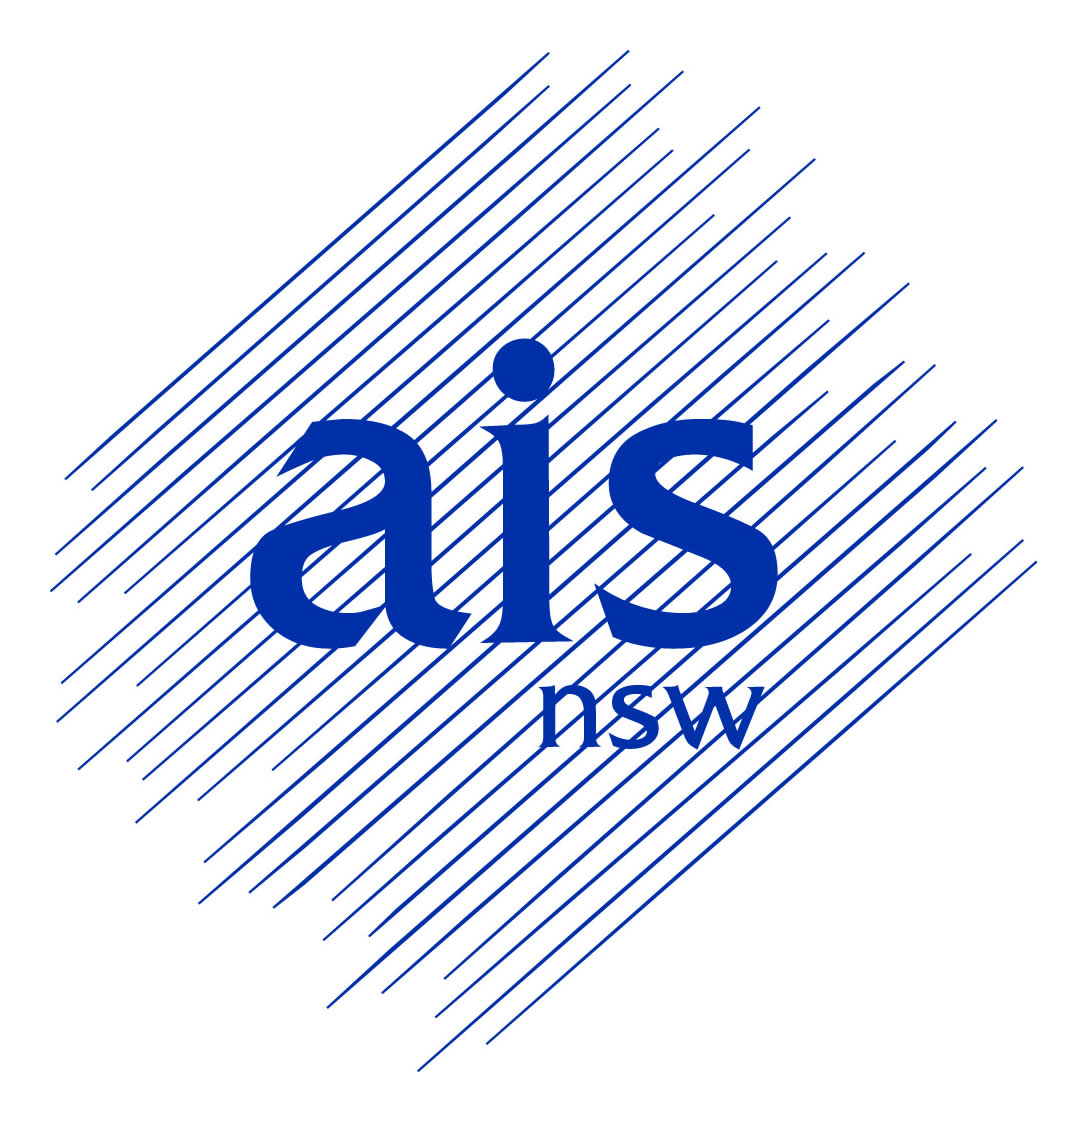 logo_in blue_pms534C.jpg